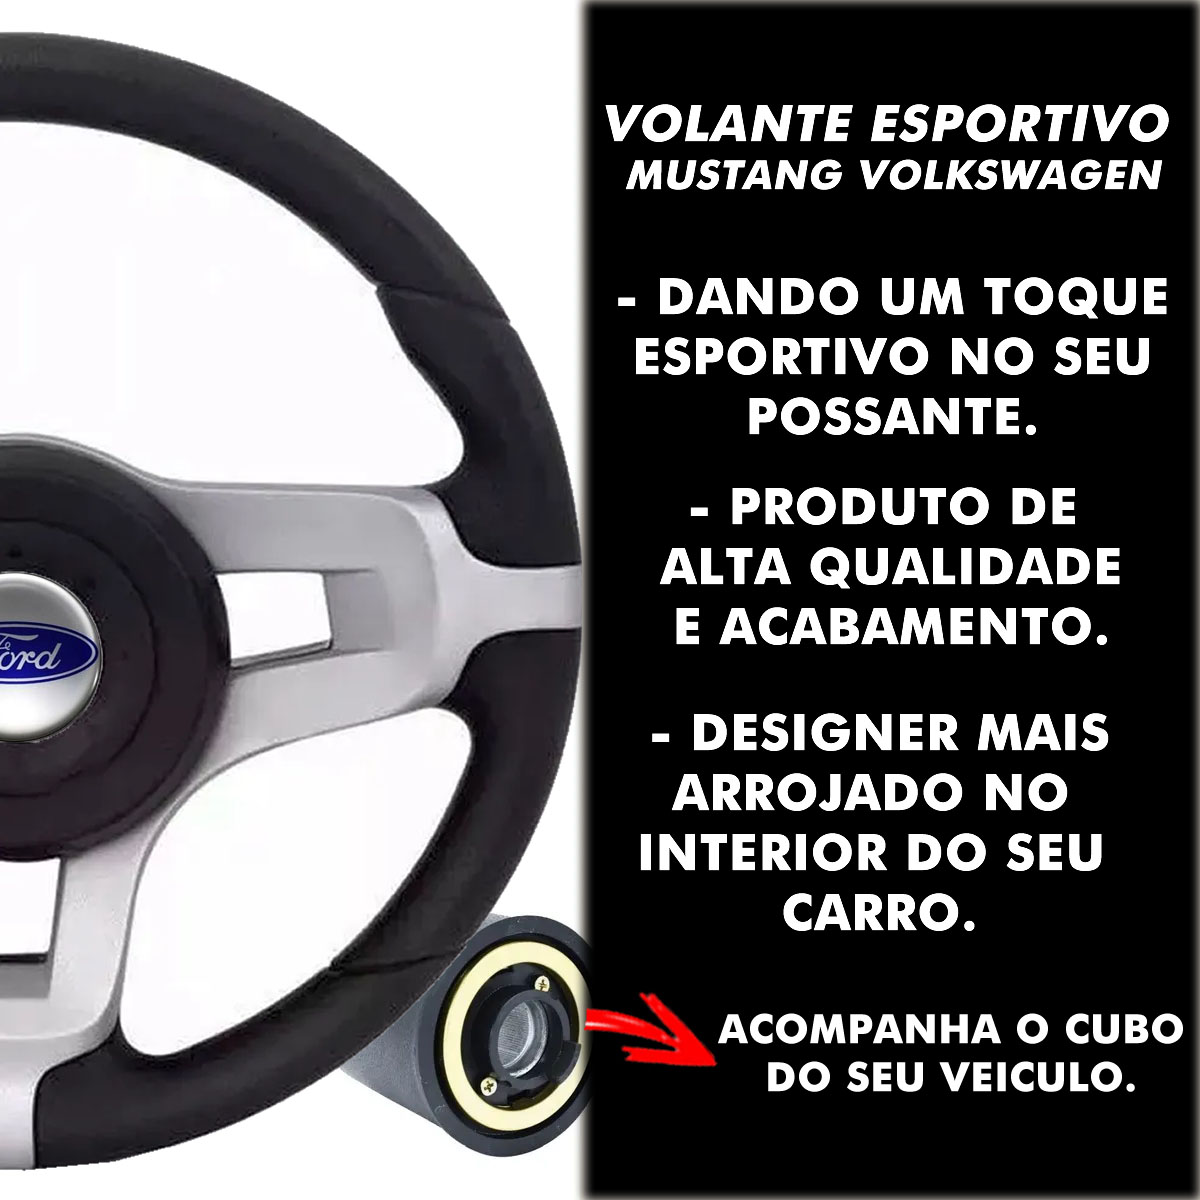 Volante Ford Mustang Esportivo Cubo Fiesta Ka Ecosport Escort Hobby Zete F100 F1000 F75 F250 Poliparts